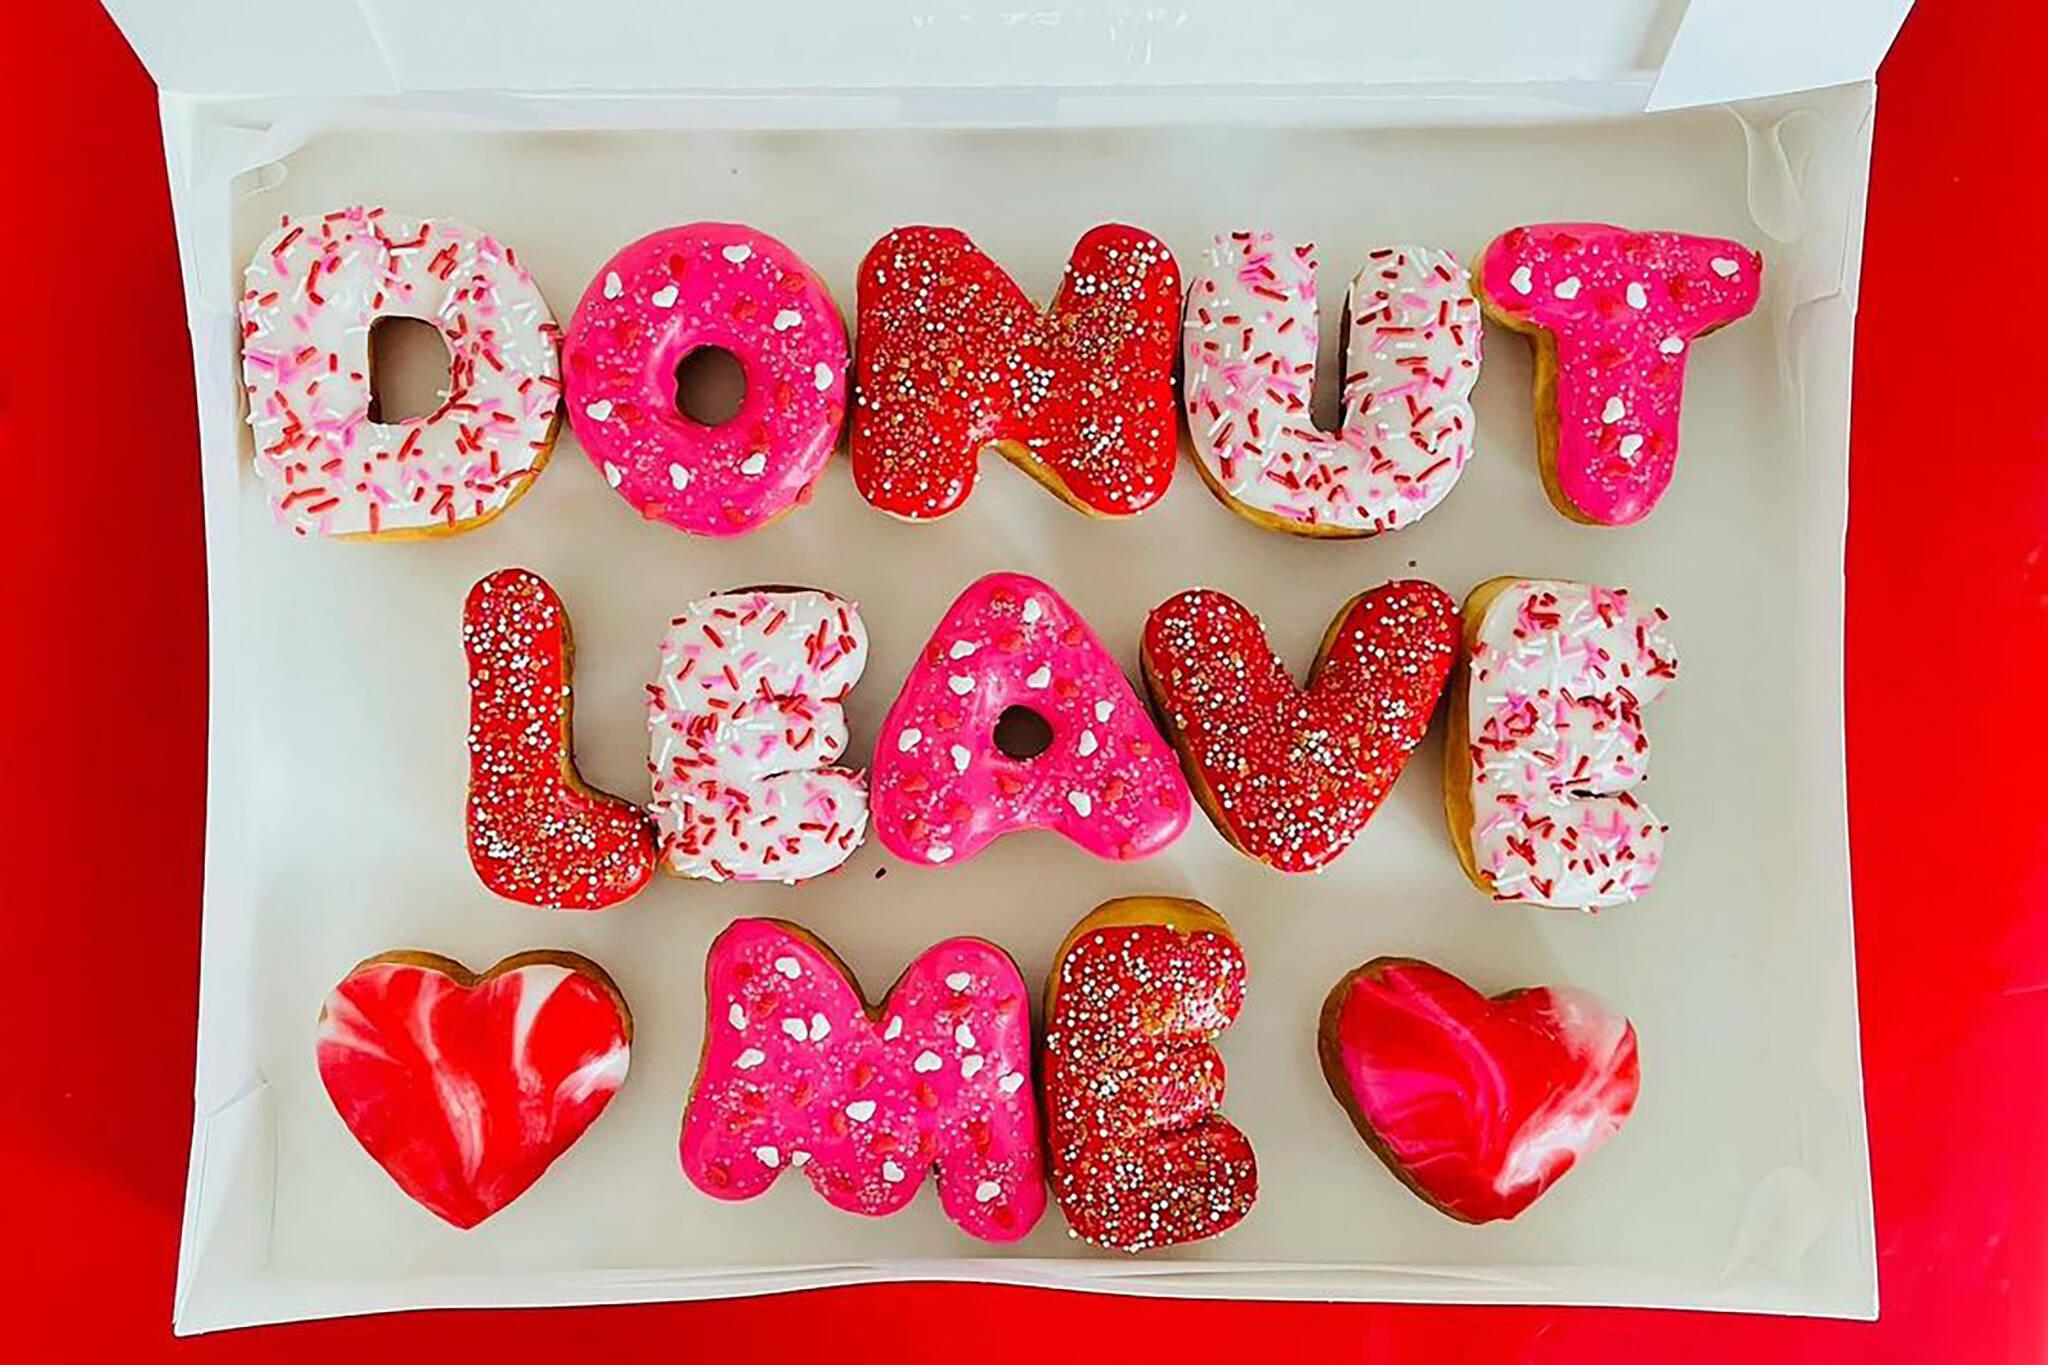 letterbox doughnuts toronto